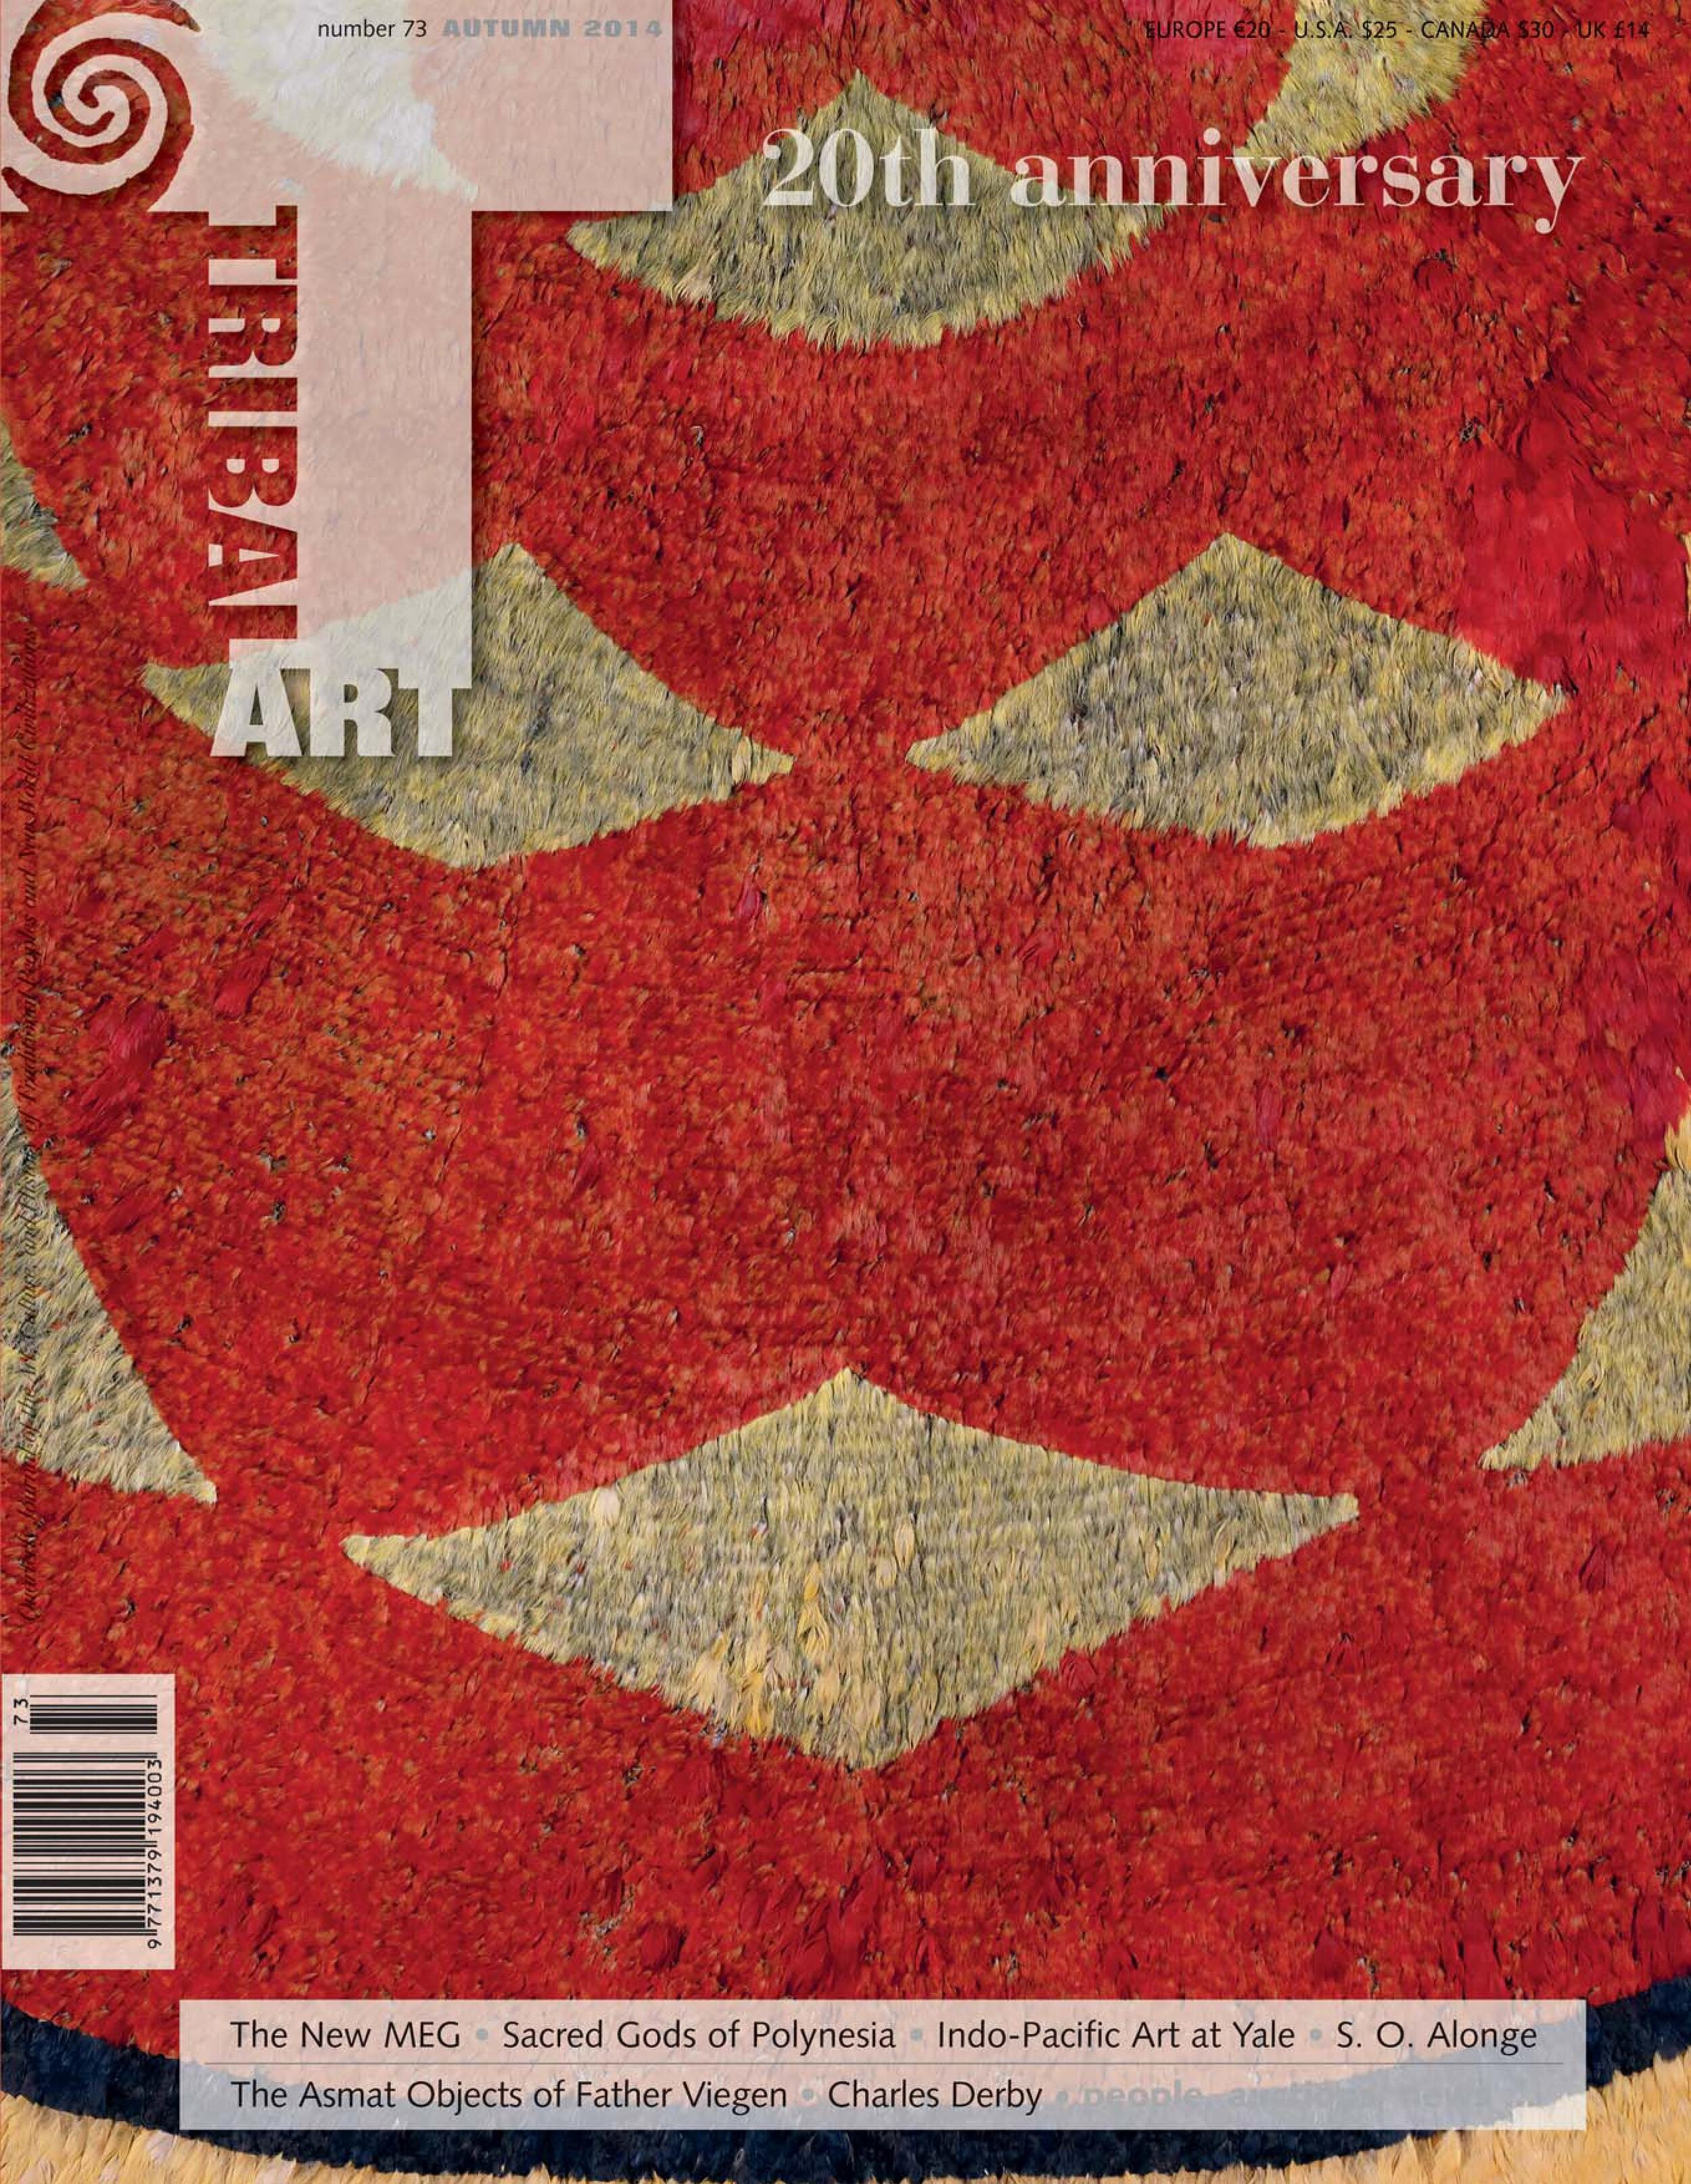 Tribal Art Magazine Autumn 2014 Number 73